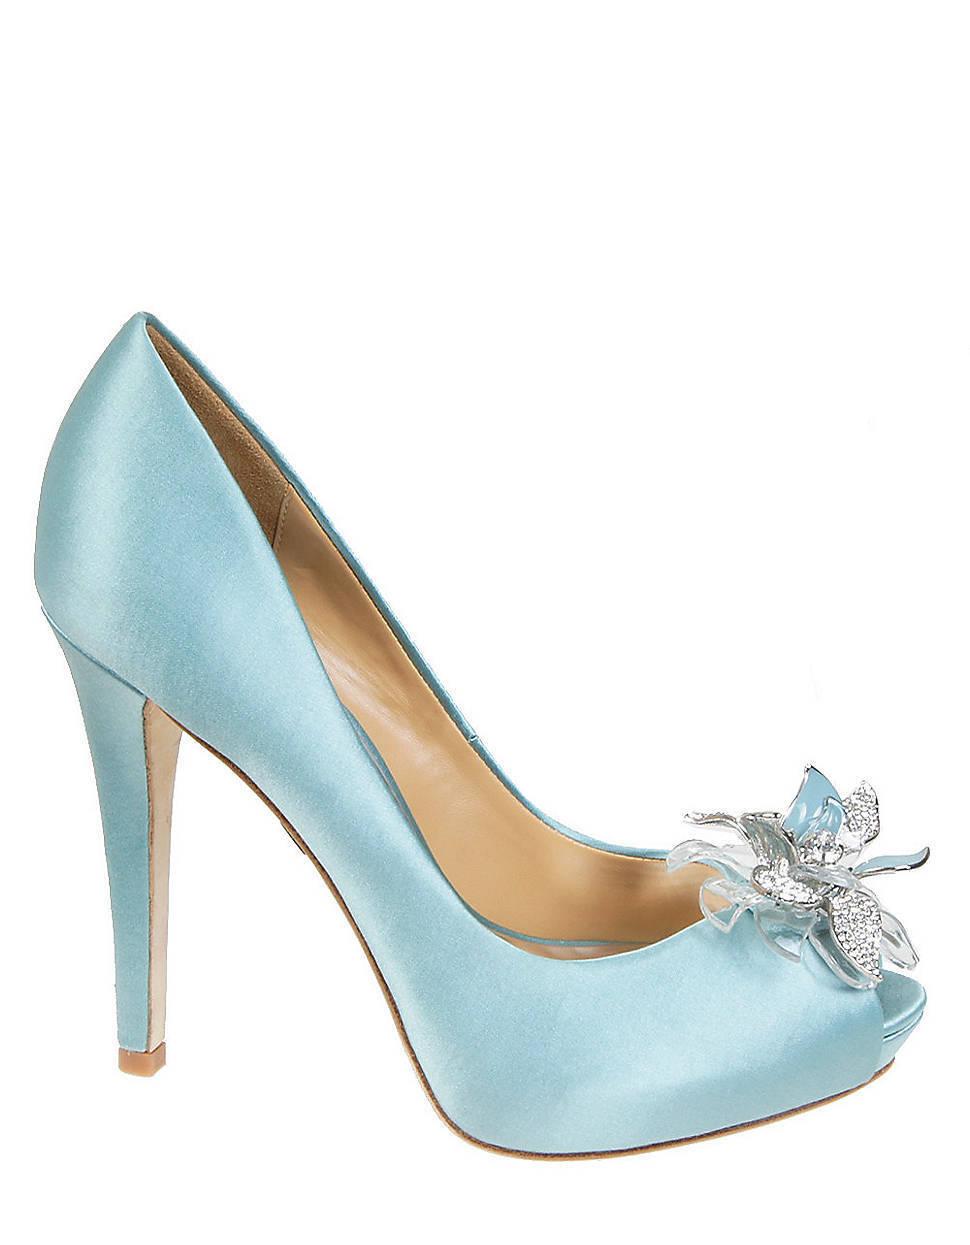 Badgley Mischka CLEONE wedding bridal open toe pumps Nile bleu chaussures 7,5 NEW